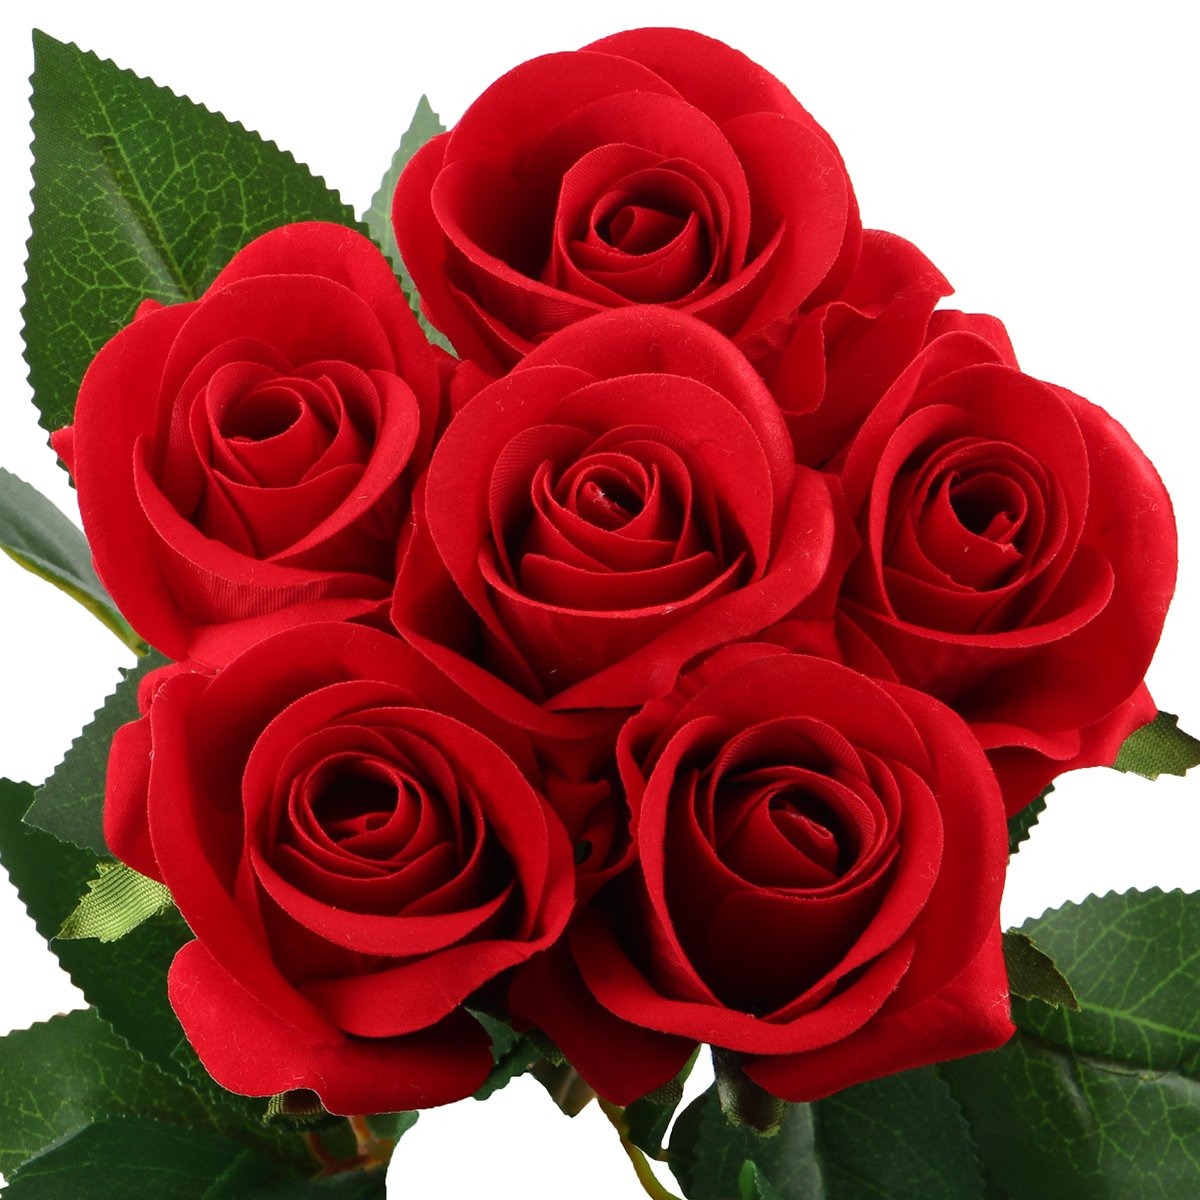 Amazon.com: Artificial Rose Flowers,Fake Silk Bouquet for Wedding ...